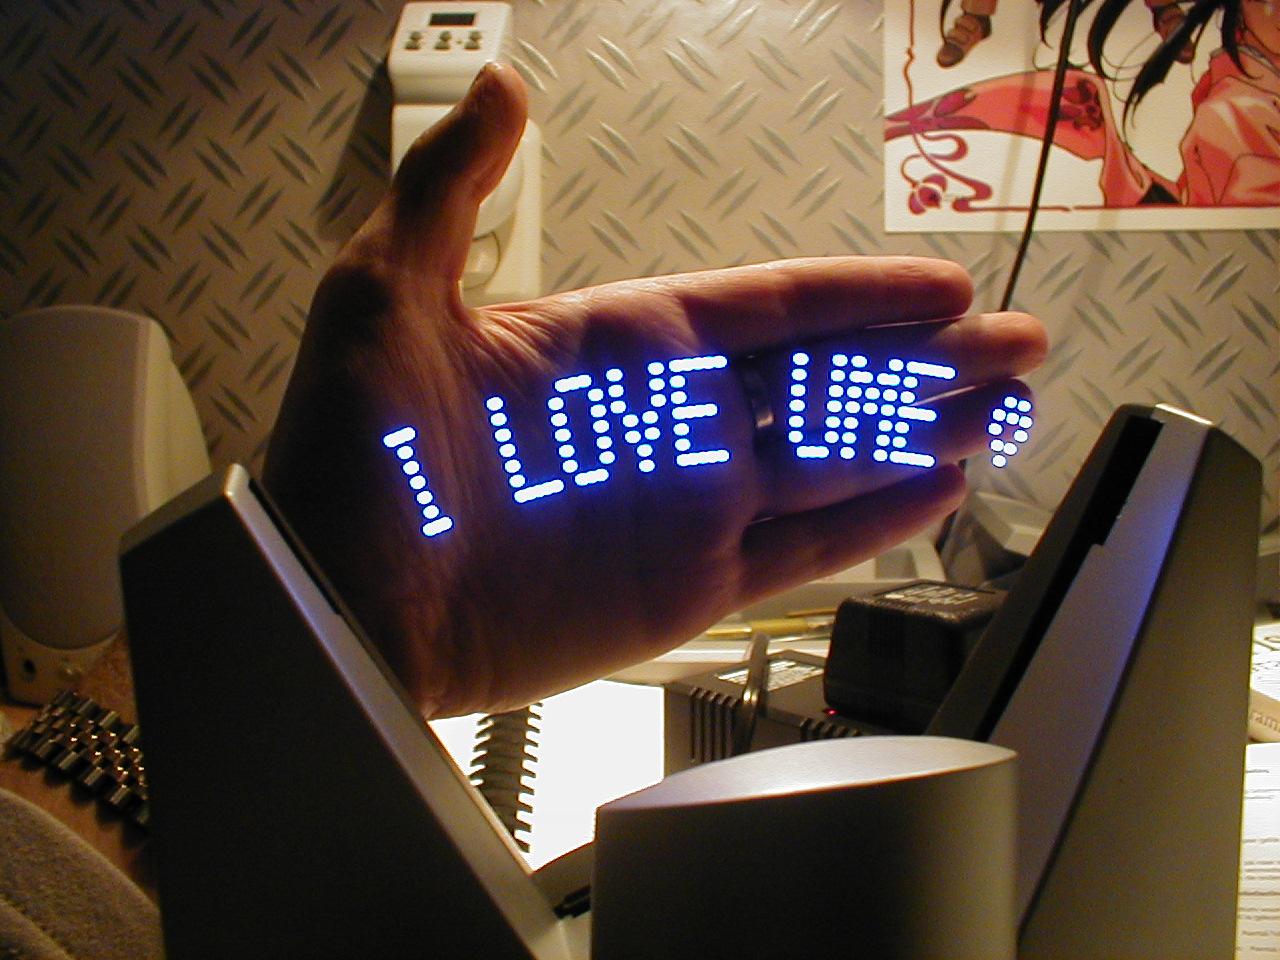 i love you blue led banner gadget light sign dario